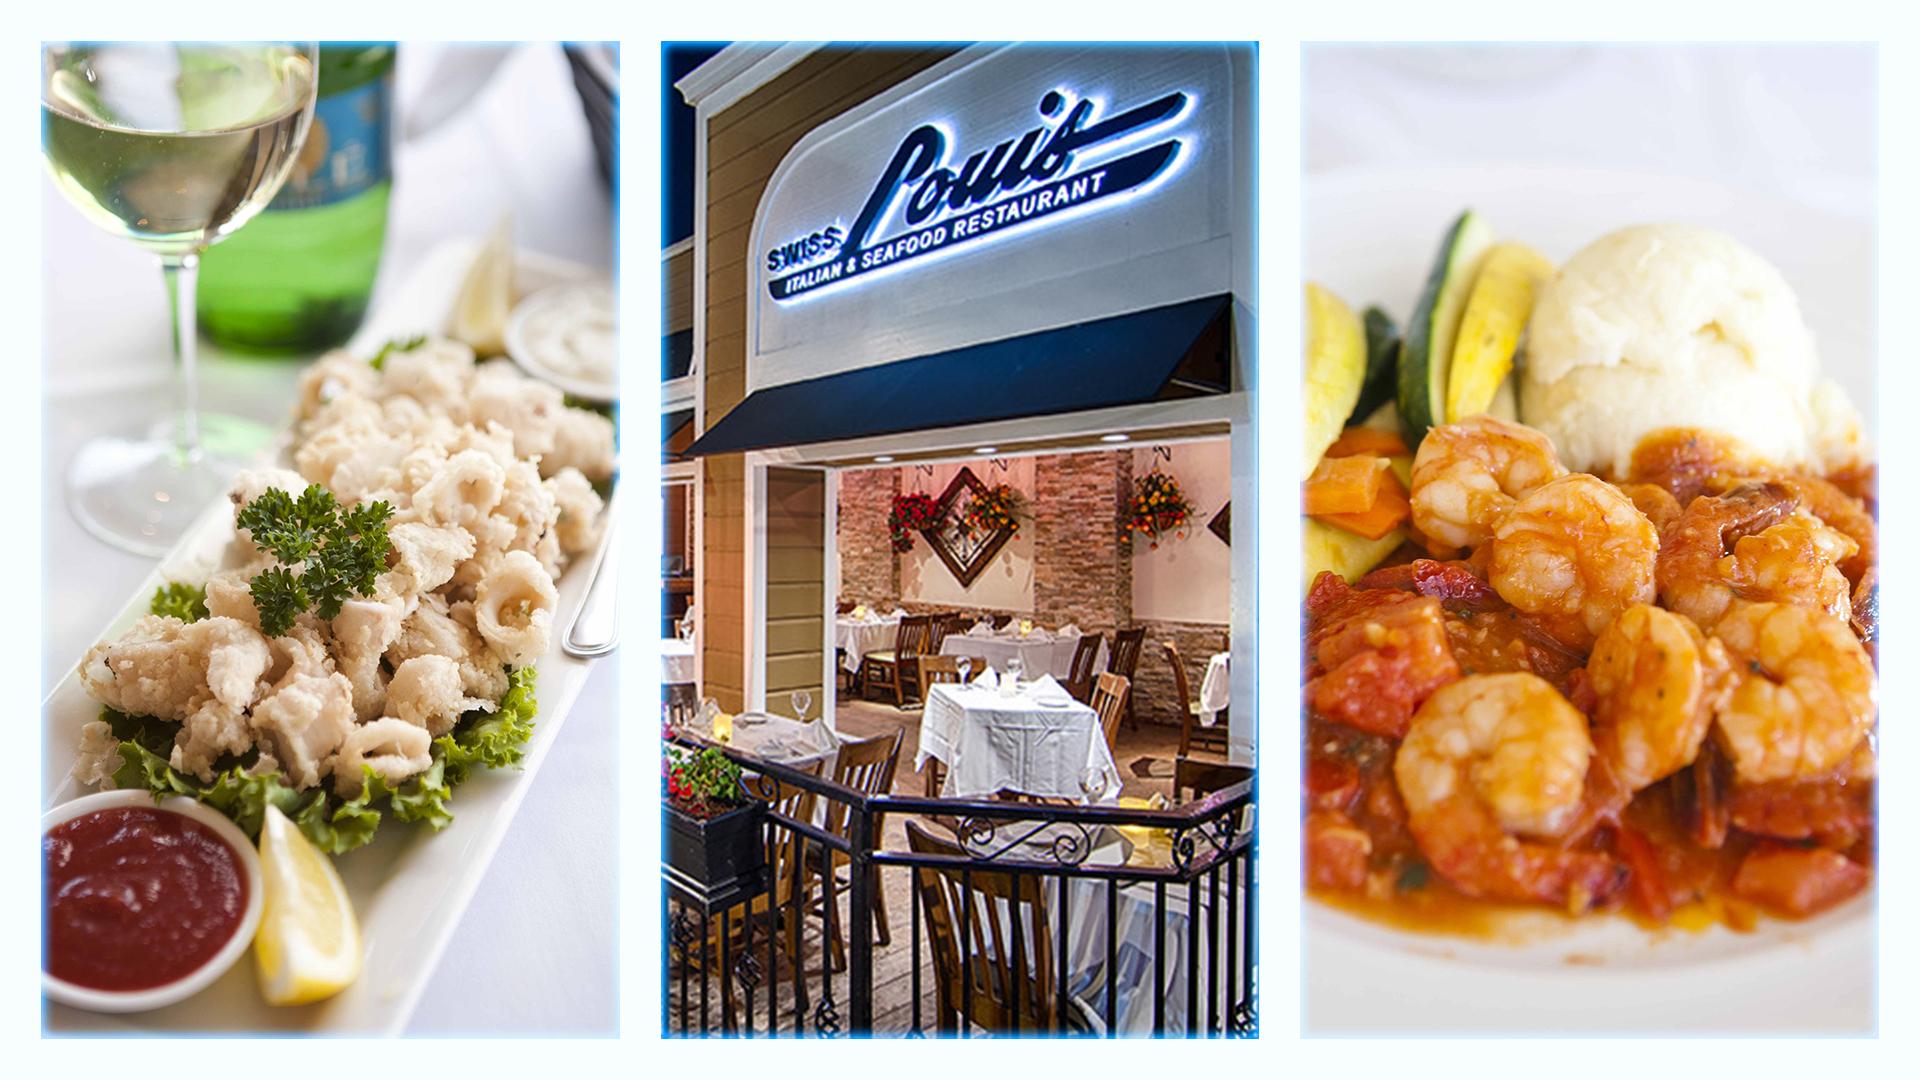 National ENQ Review of Swiss Louis Italian & Seafood Restaurant – Pier 39, San Francisco, California